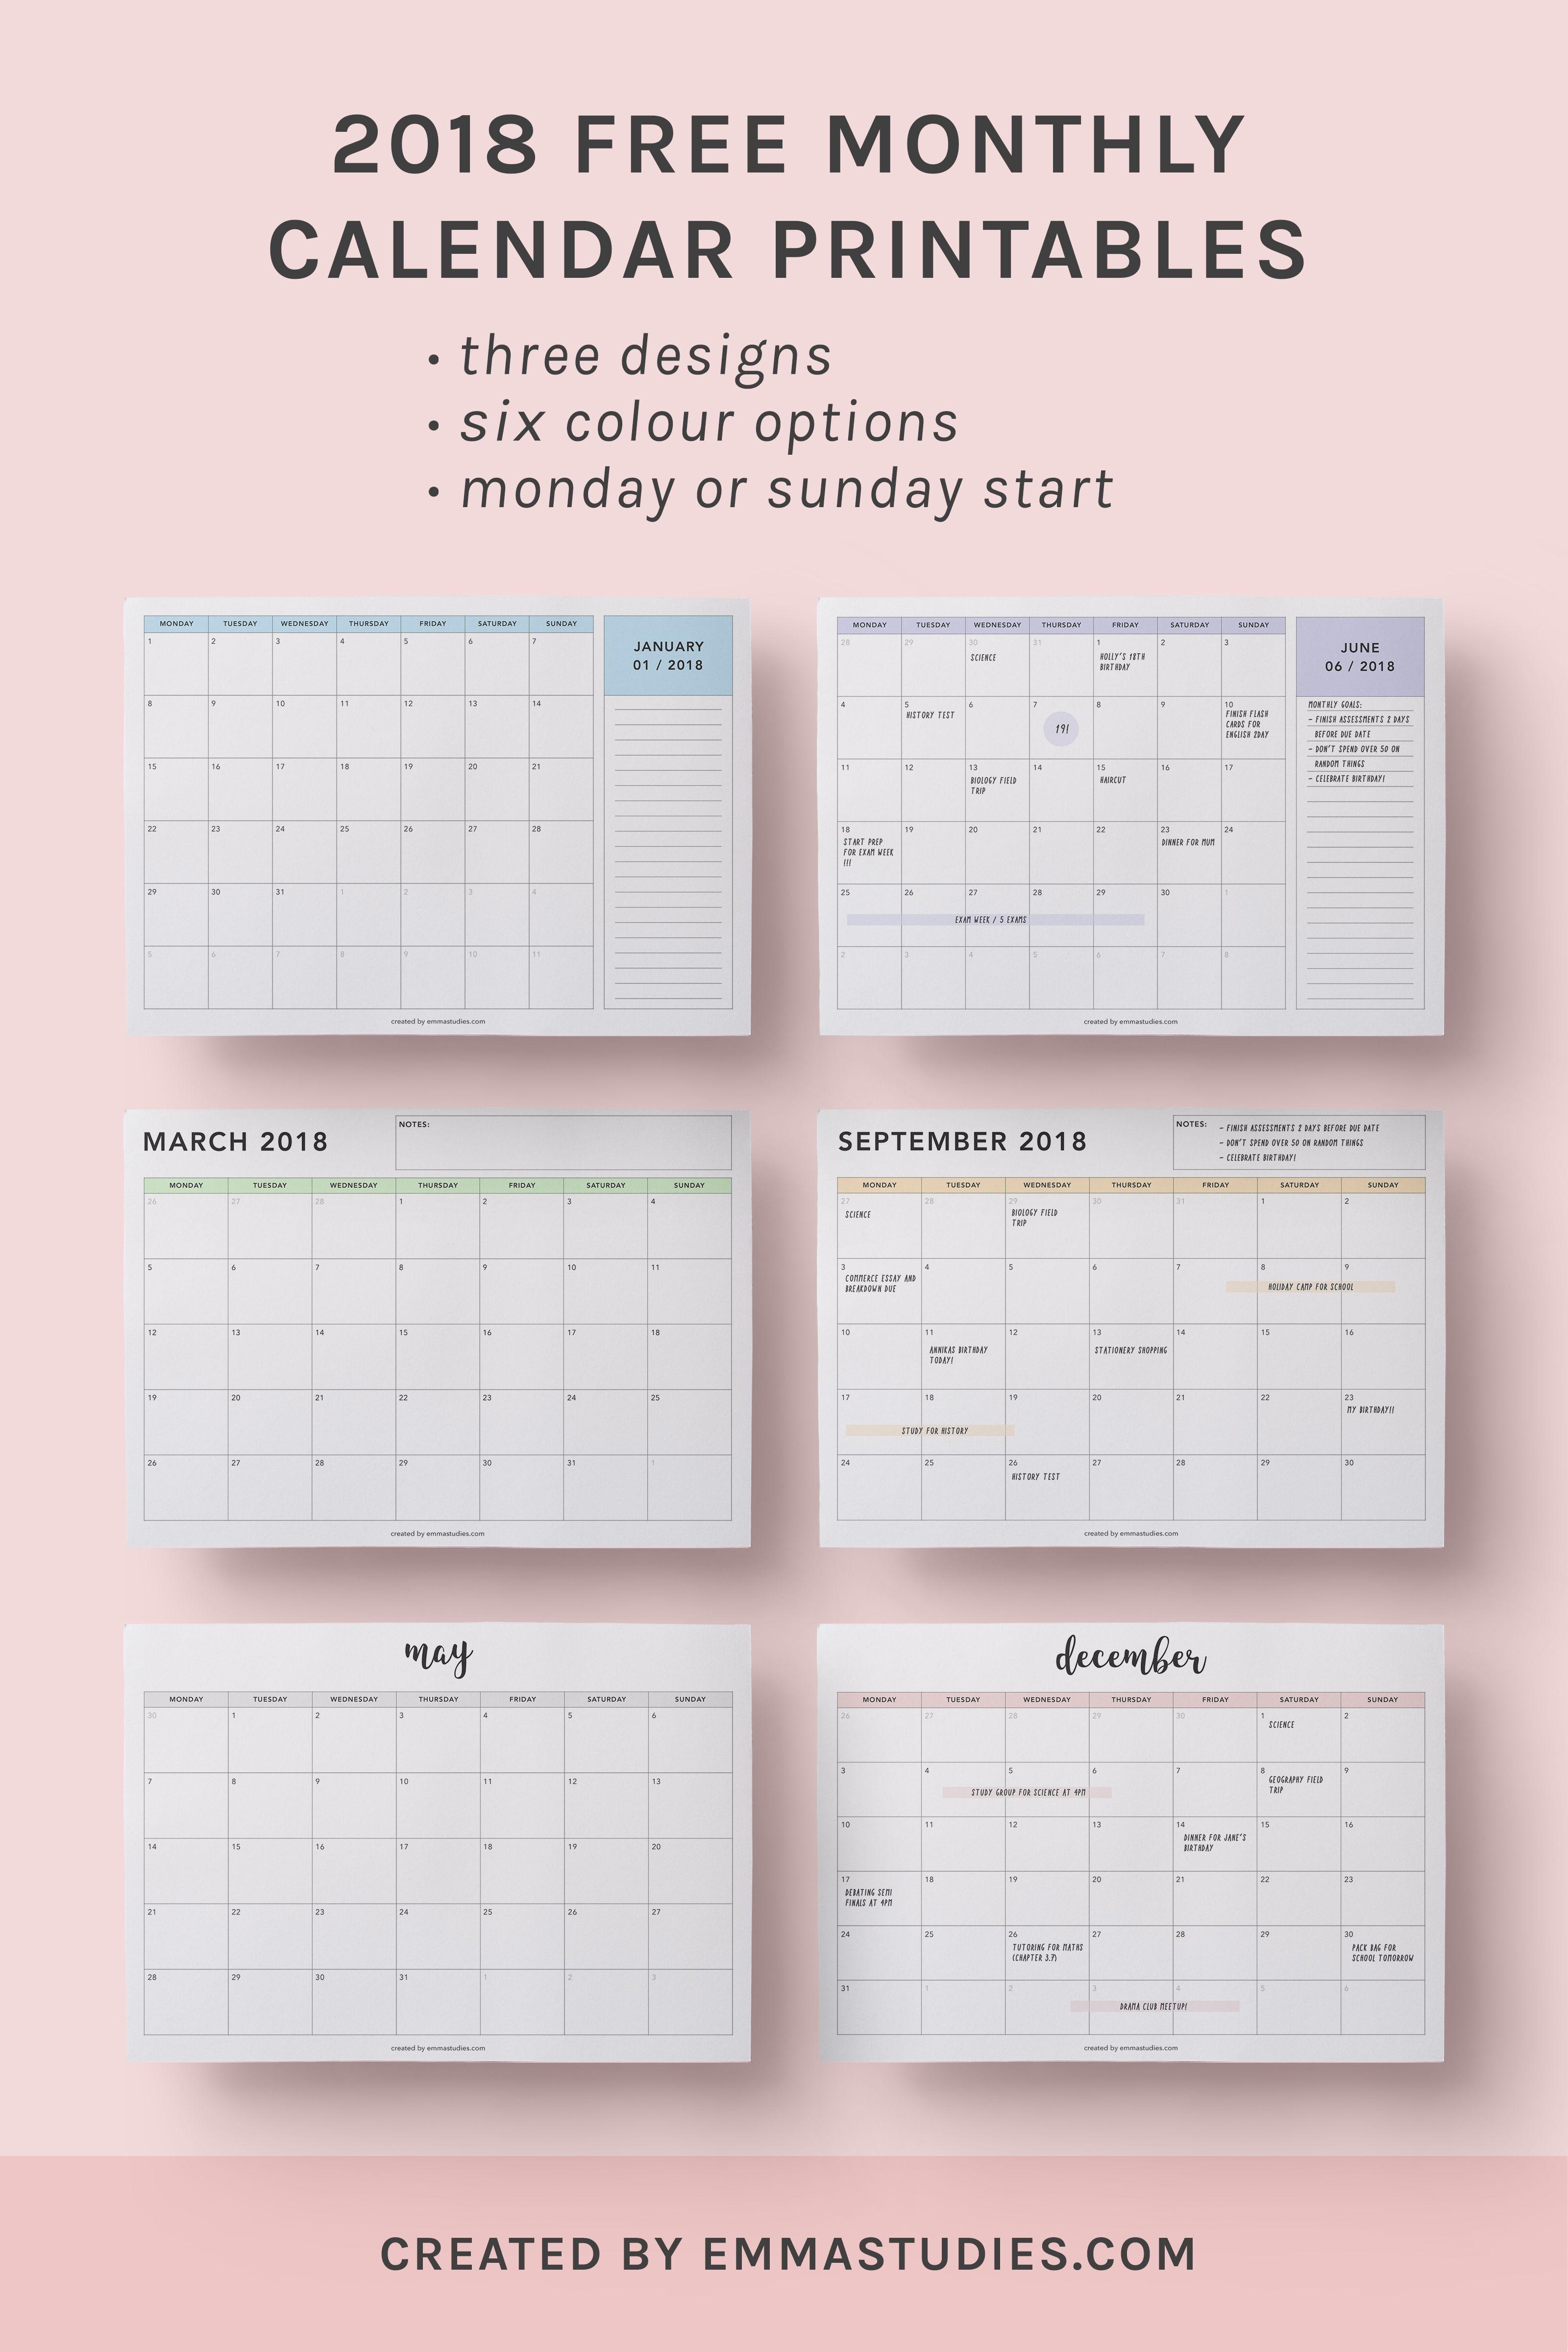 2018 monthly free printable calendars by emmastu s